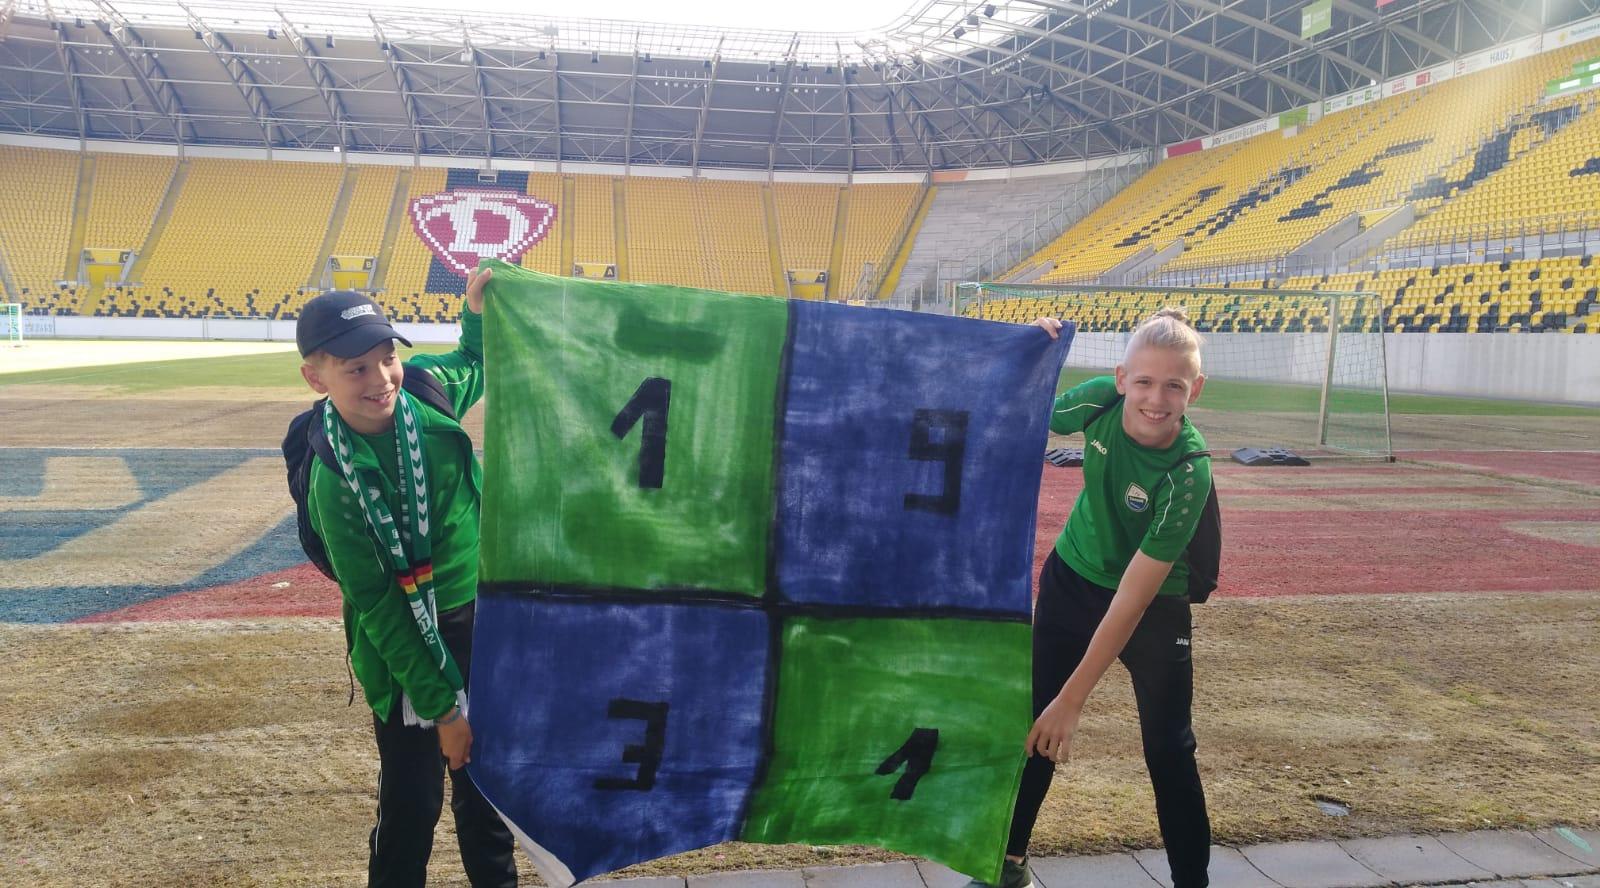 20180623 2005er beim Saxony-Cup in Dresden (2)